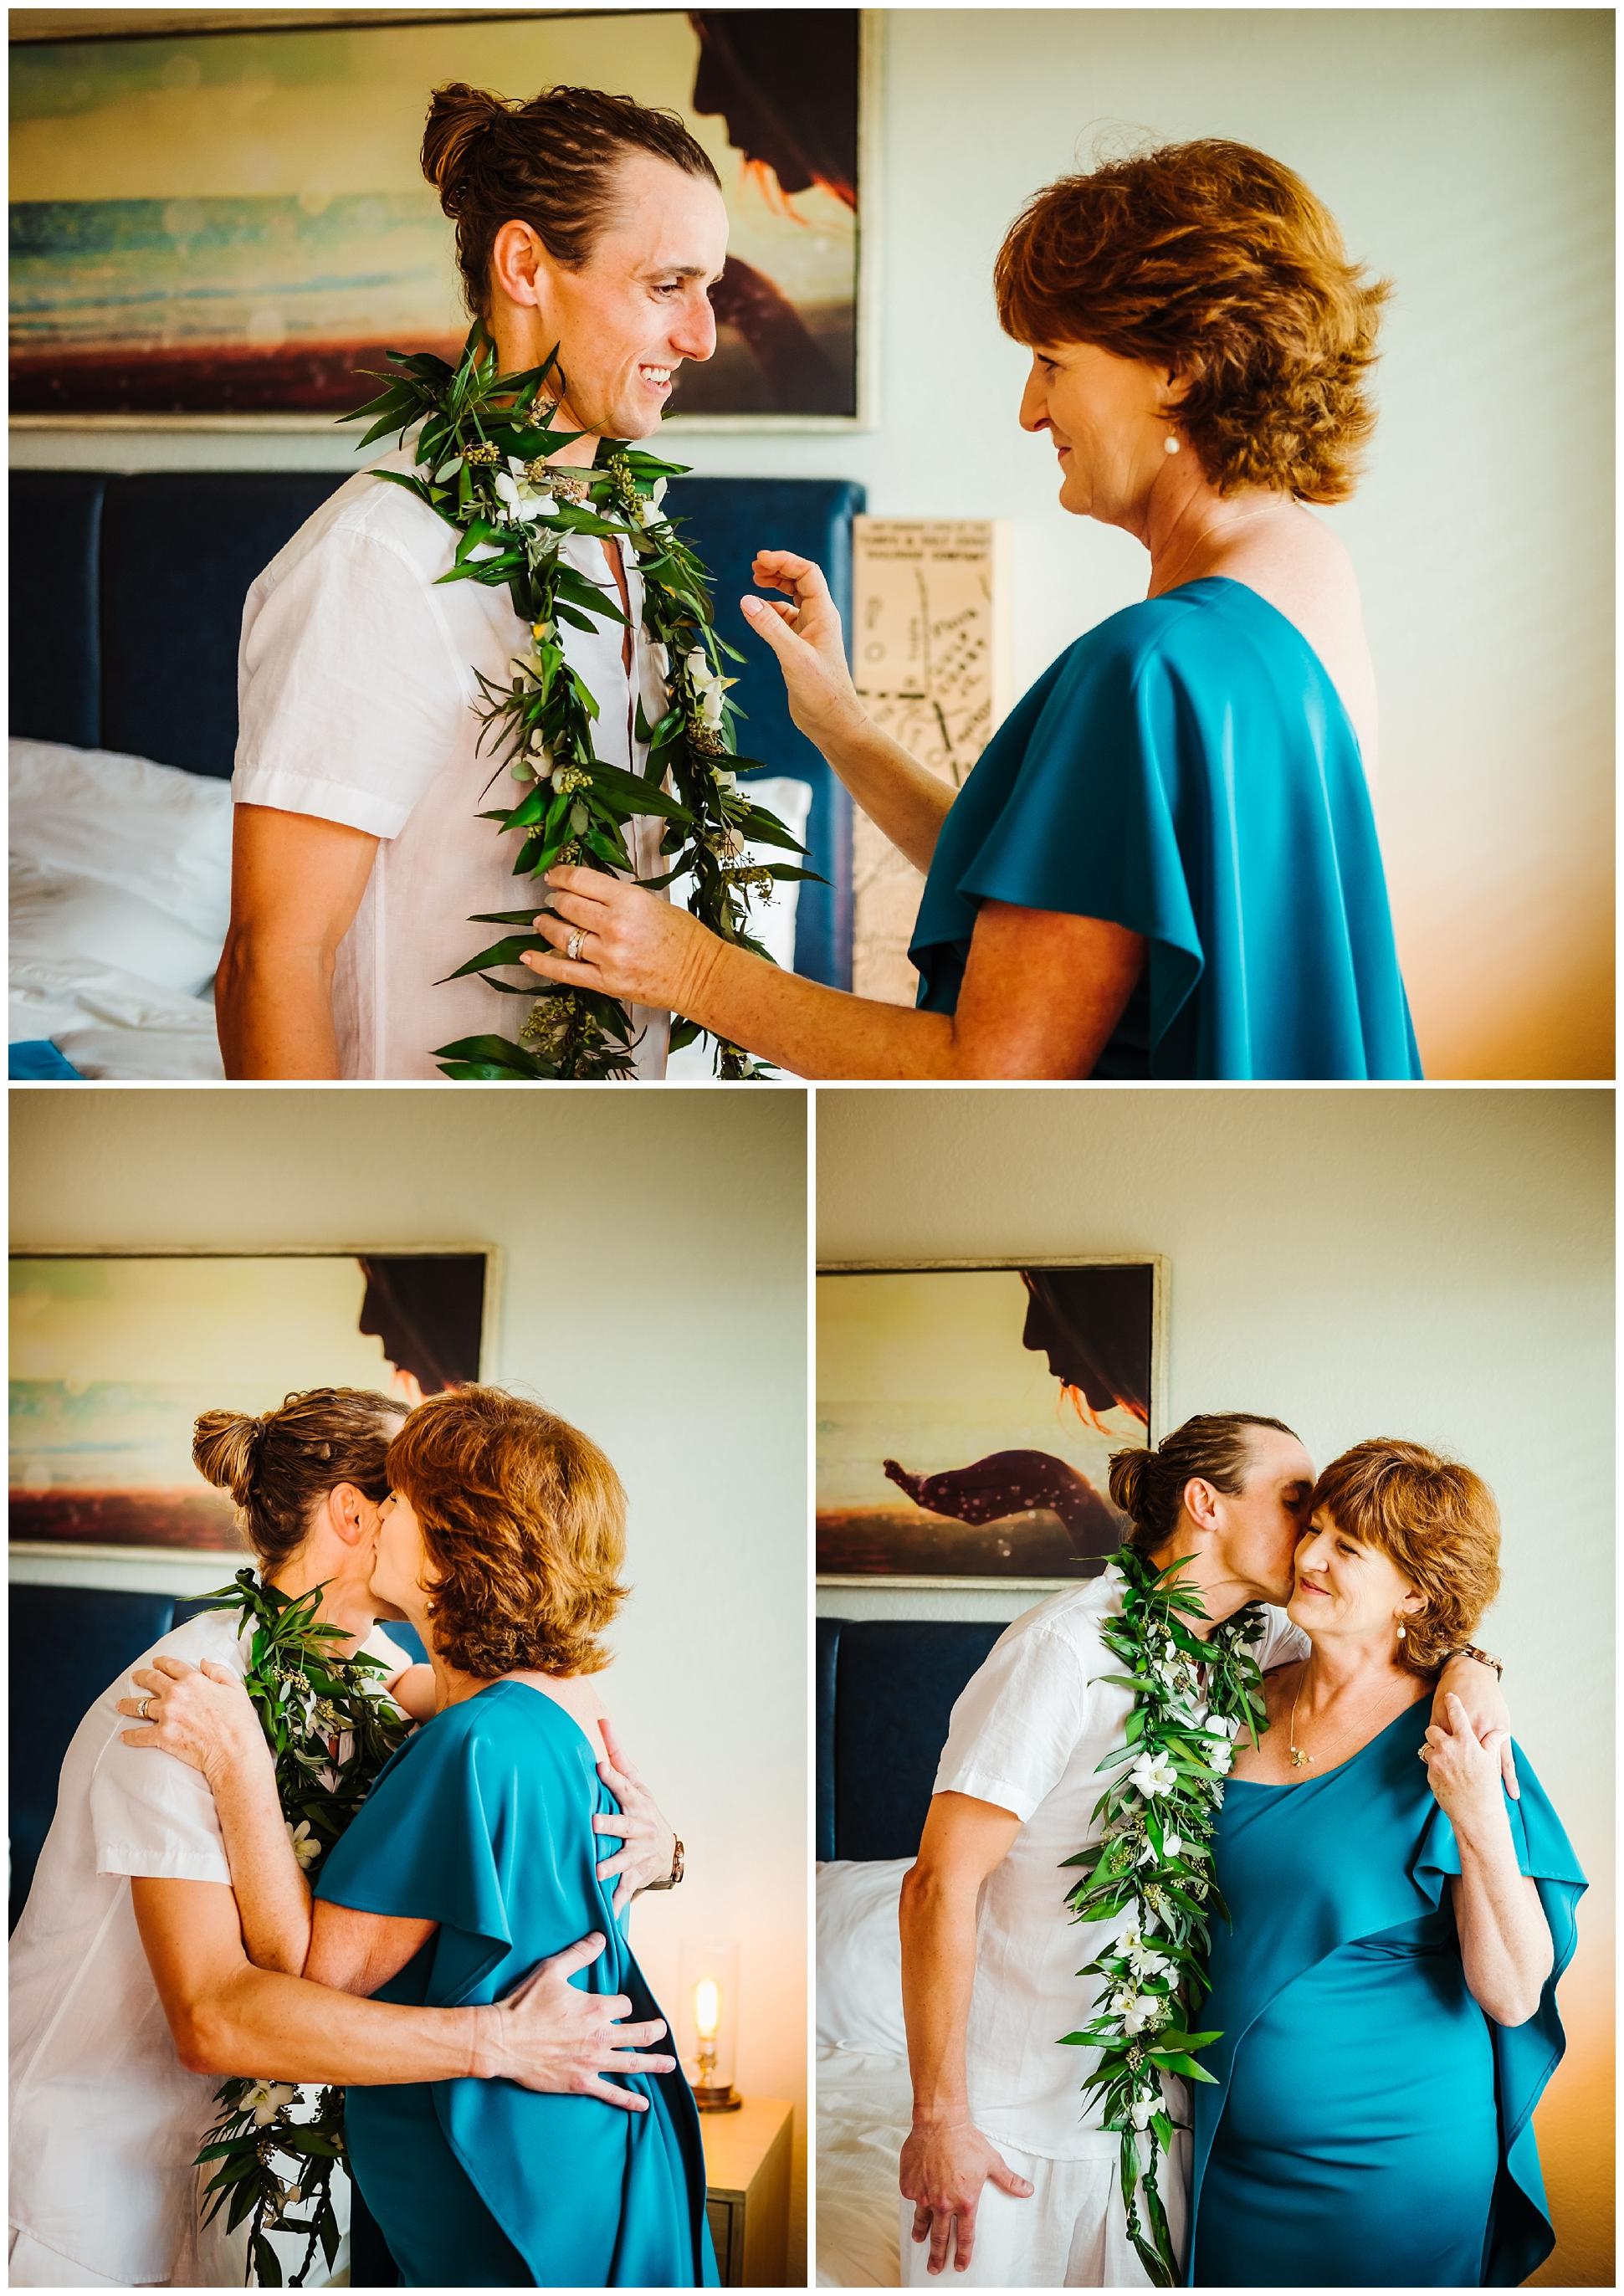 tampa-bay-wedding-photographer-barefoot-post-card-inn-tropical-hawaiin-lei-pink-pineapples-flower-crown_0131.jpg